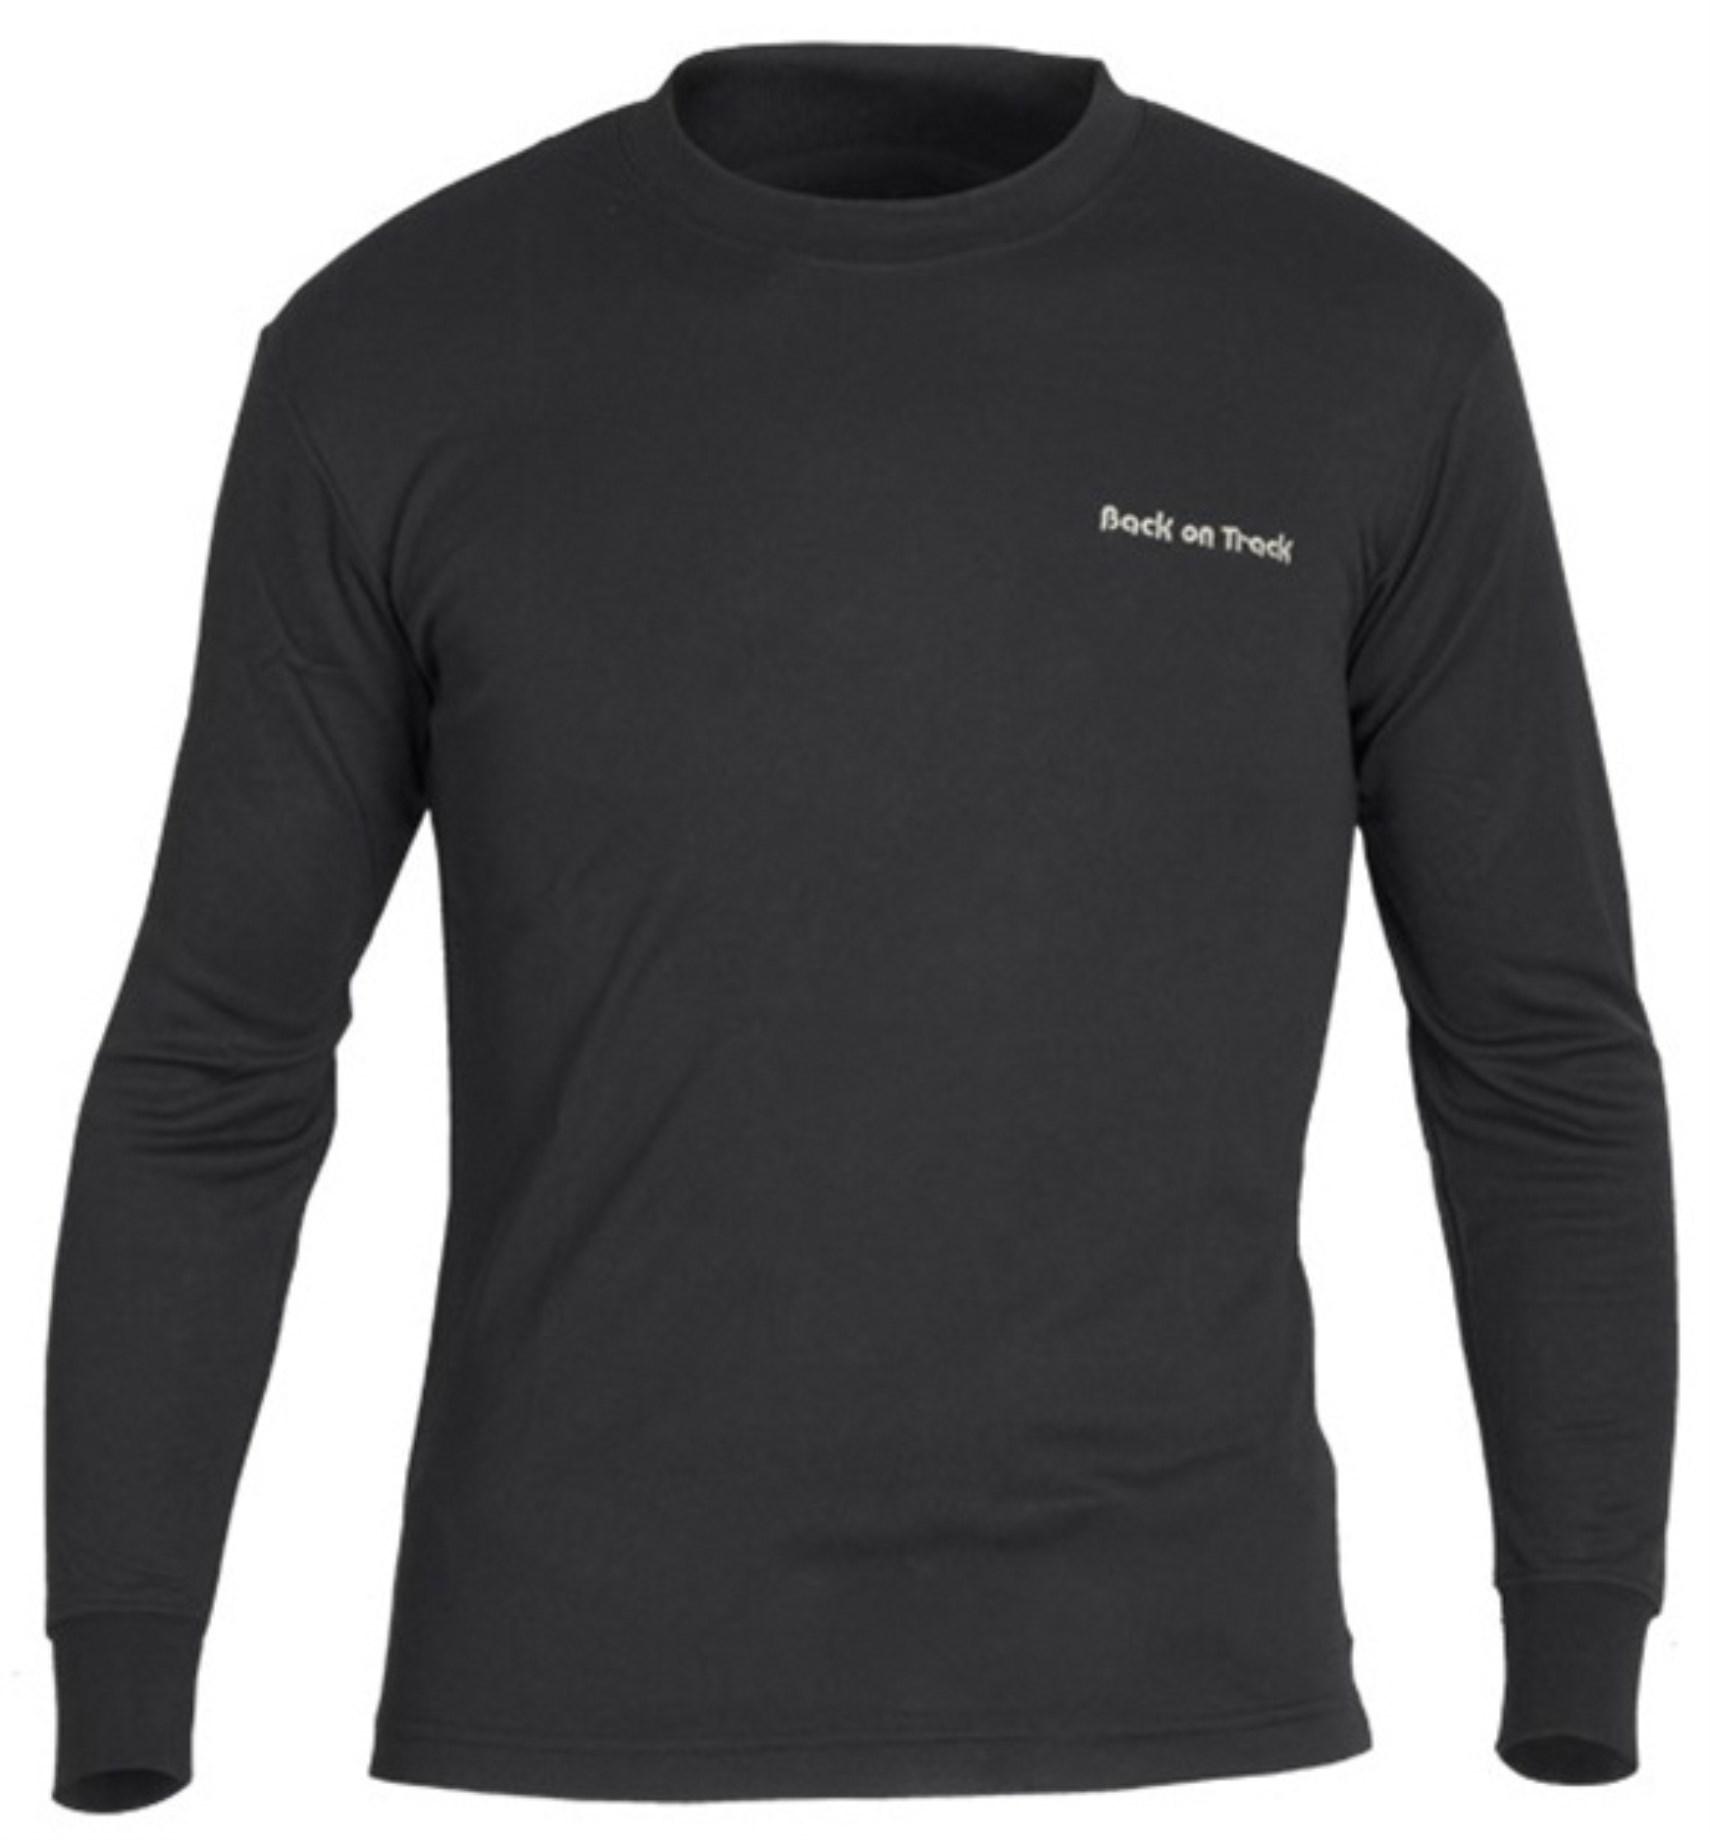 1600-langarmad_t-shirt